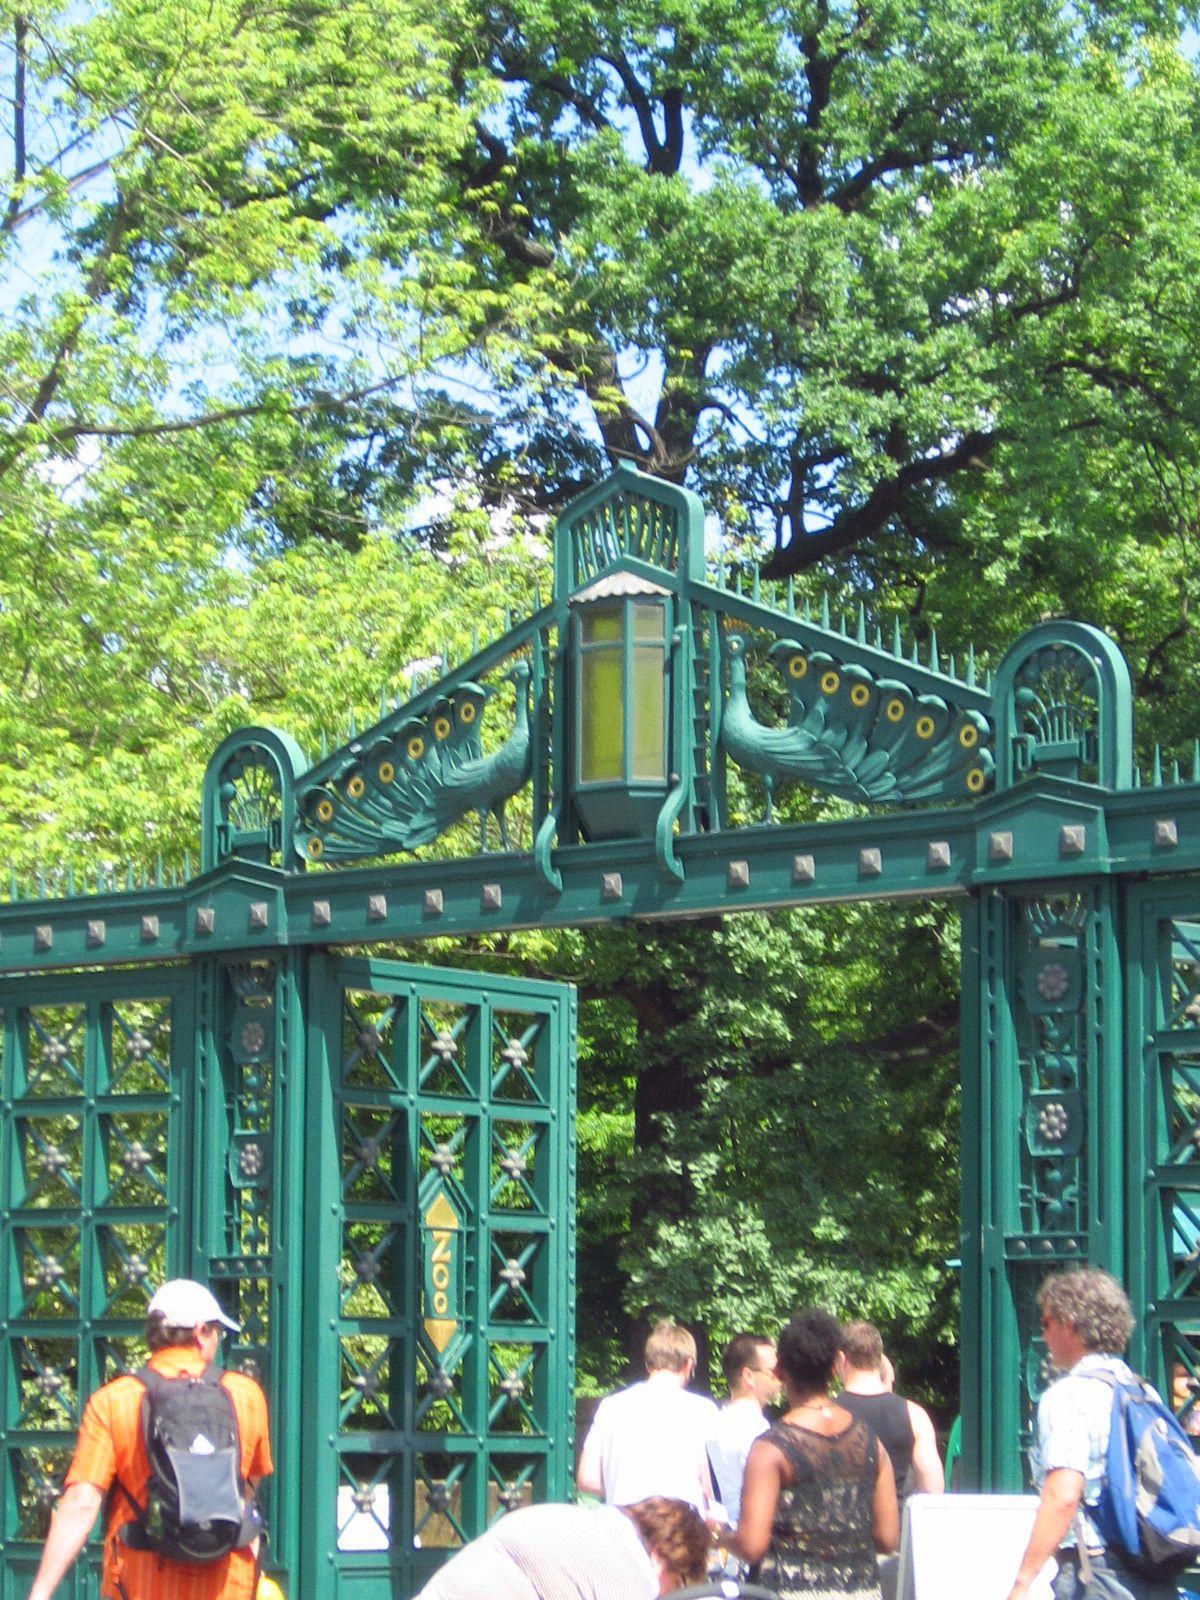 Peacock Gate Entrance To Berlin Zoo Entrance Gates Theme Park Zoo